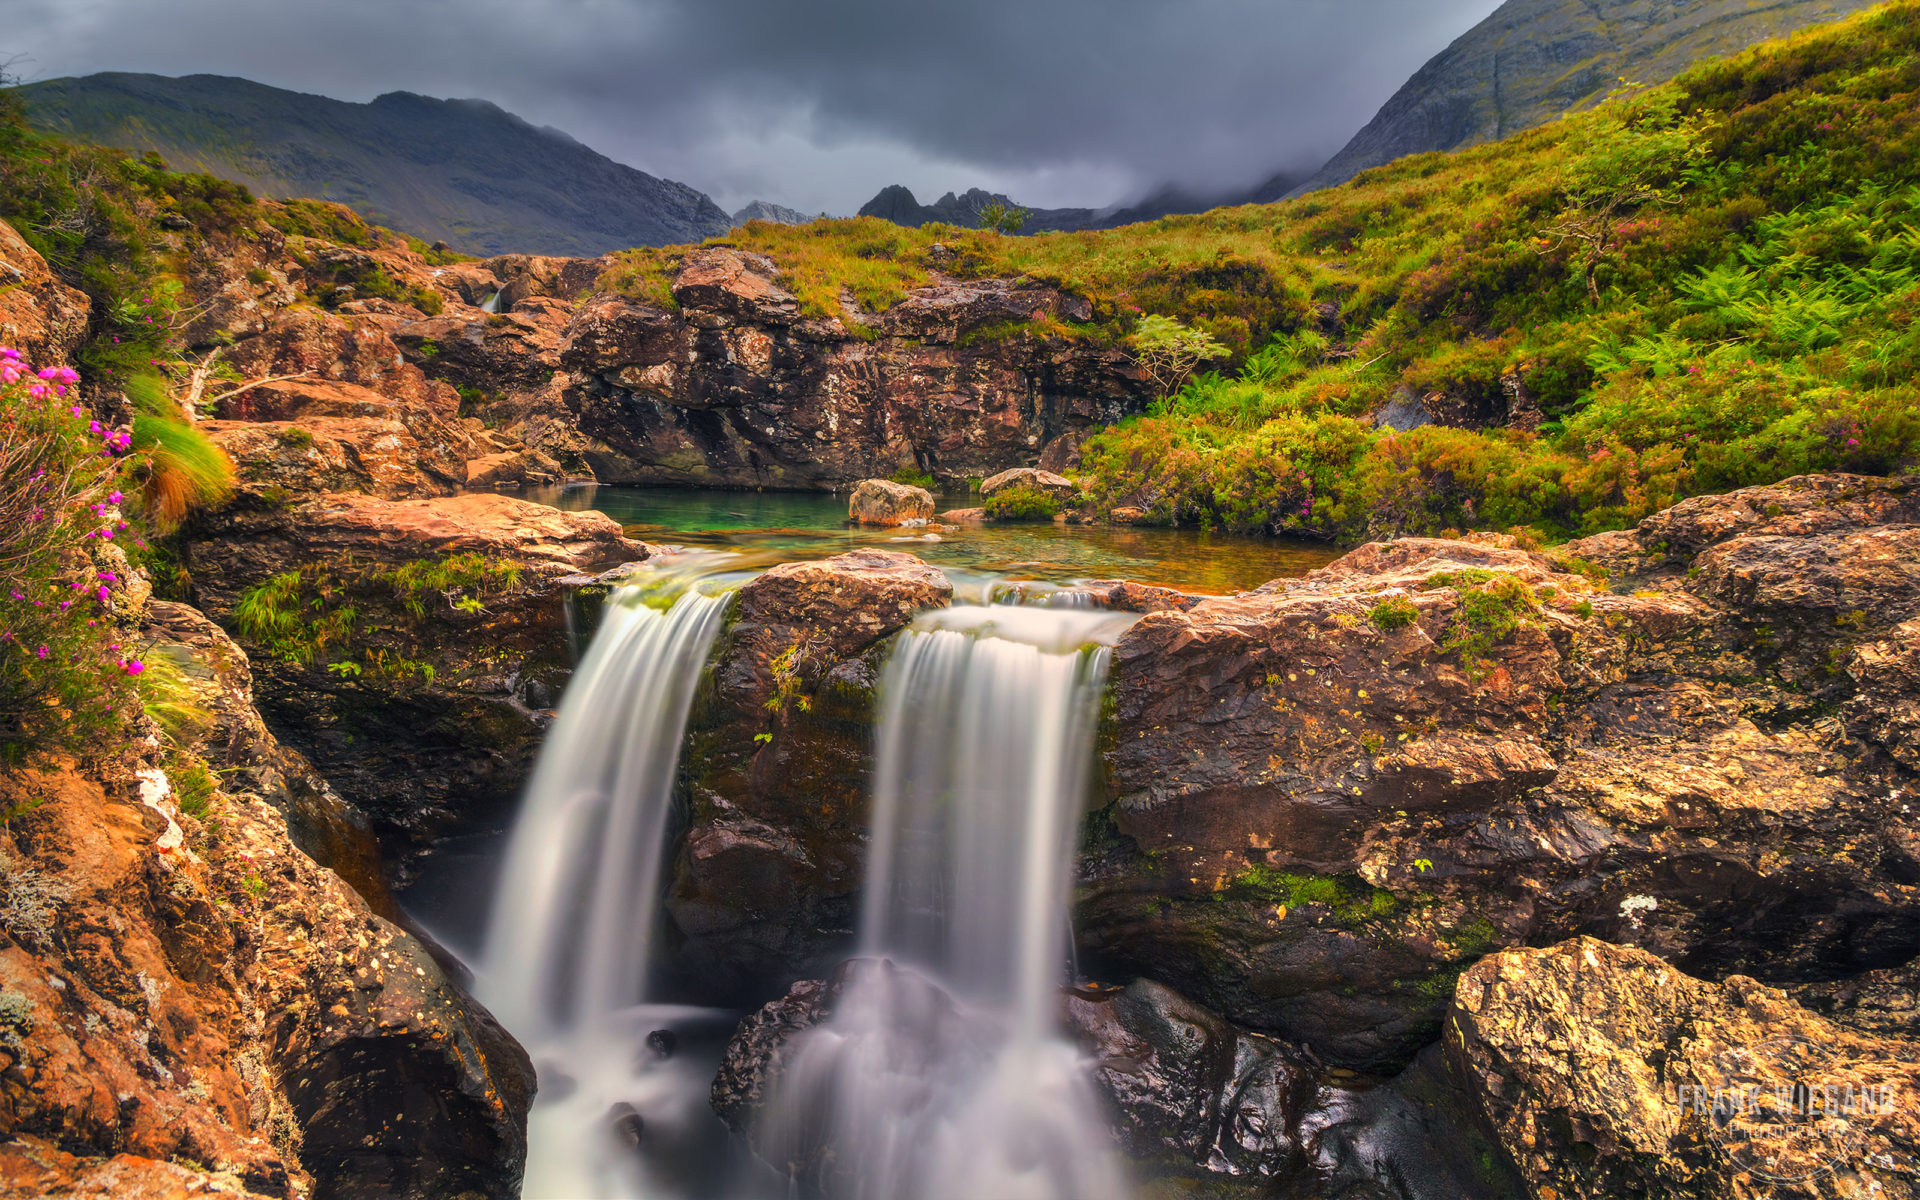 Kuang Si Falls Hd Wallpaper True Fairy Pools Isle Of Skye Scotland Wallpaper For